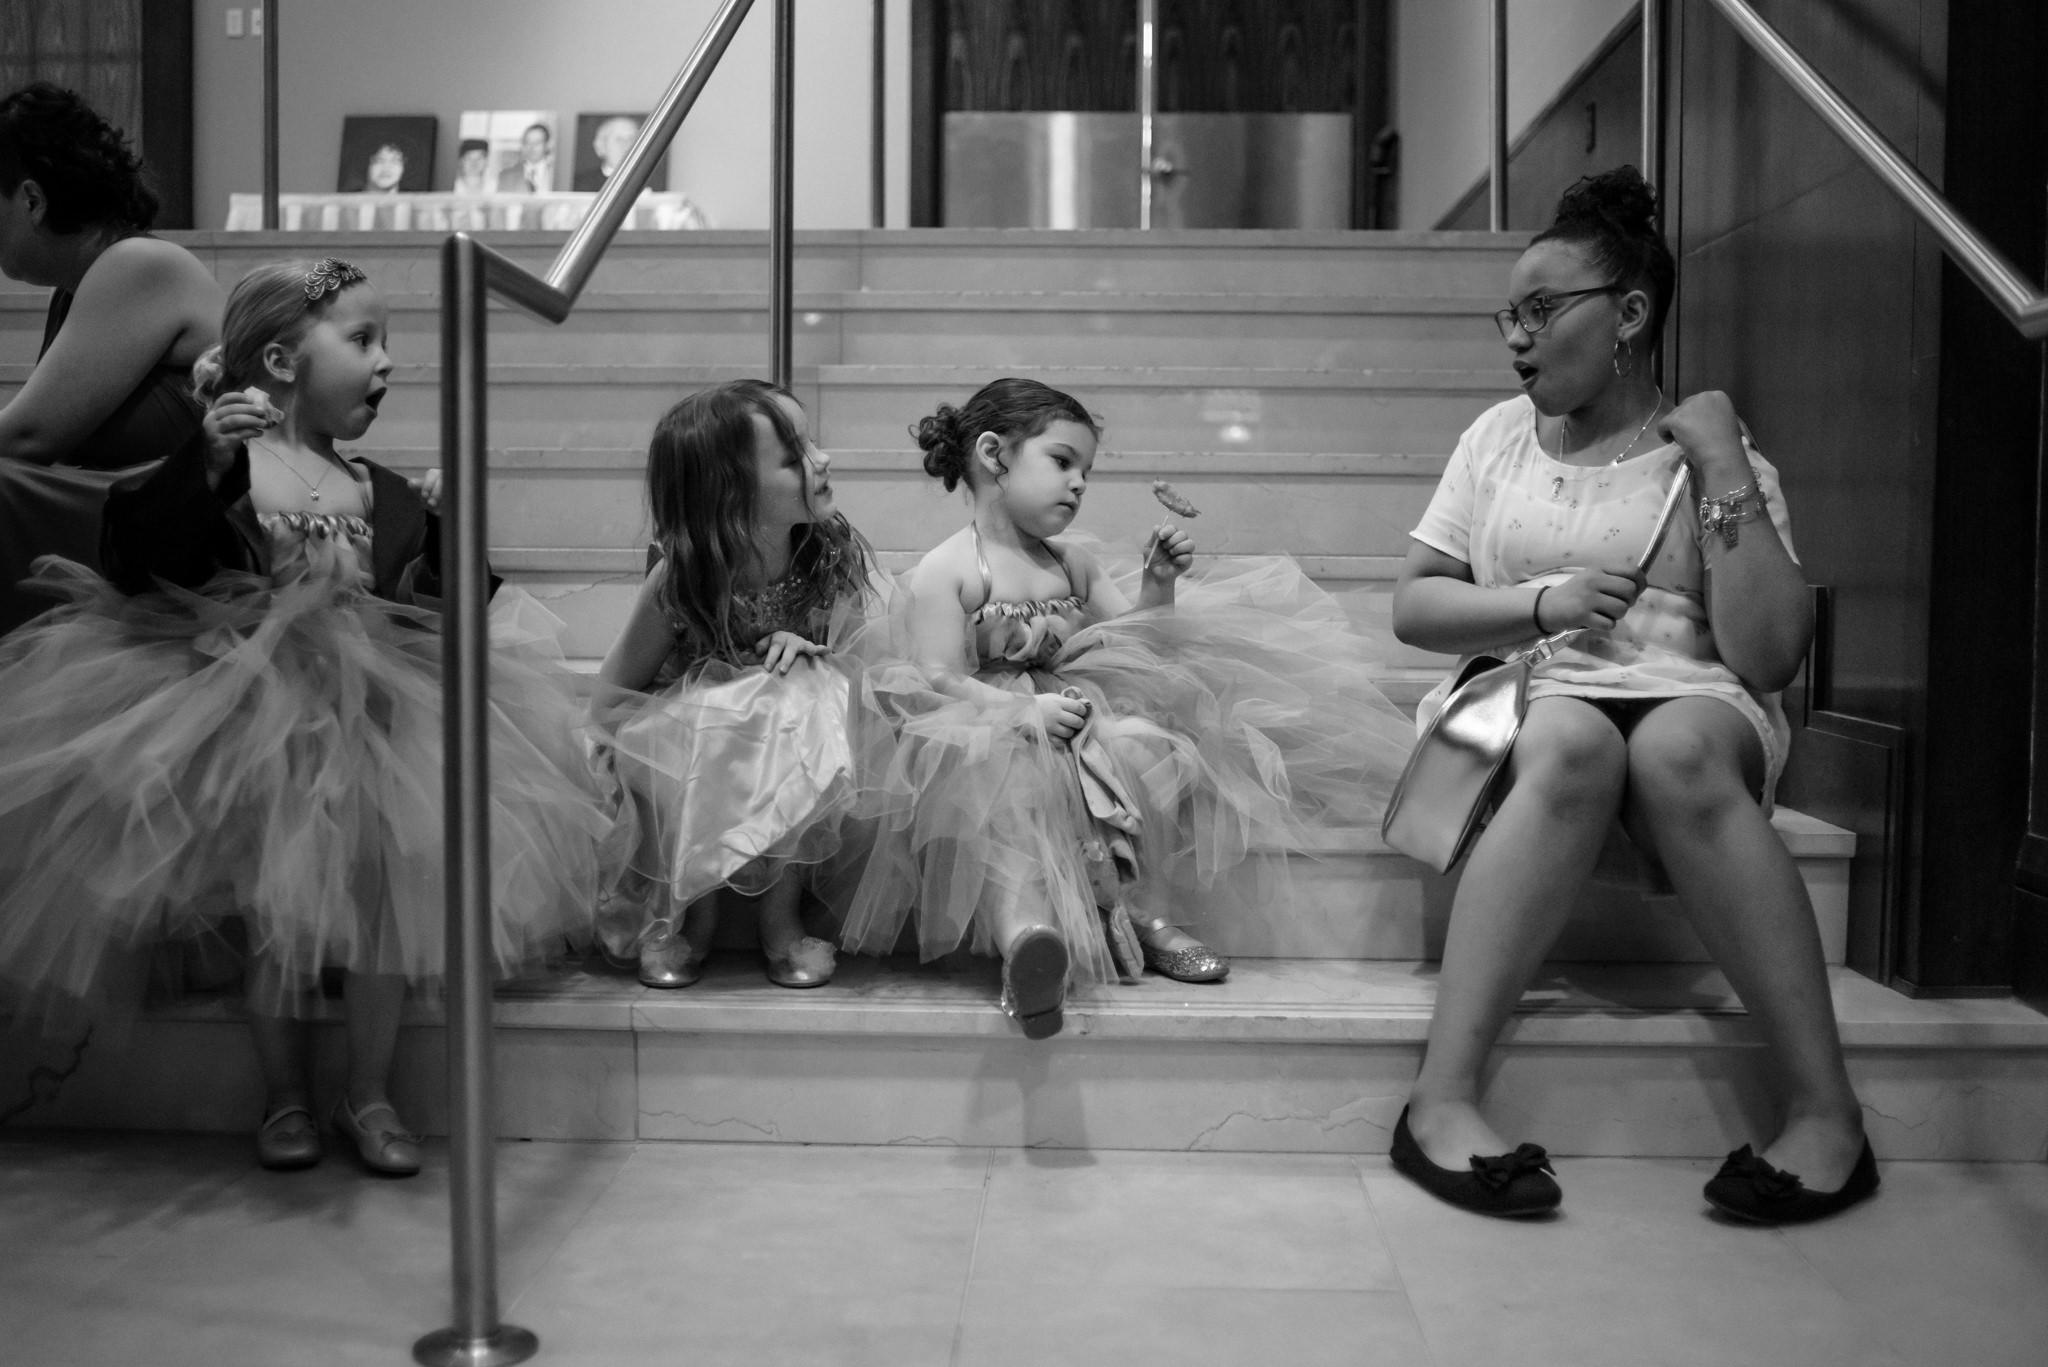 HILTON-OMAHA-WEDDING-PHOTOGRAPHER-JM-STUDIOS-OMAHA-LIV-BRICE-030.jpg